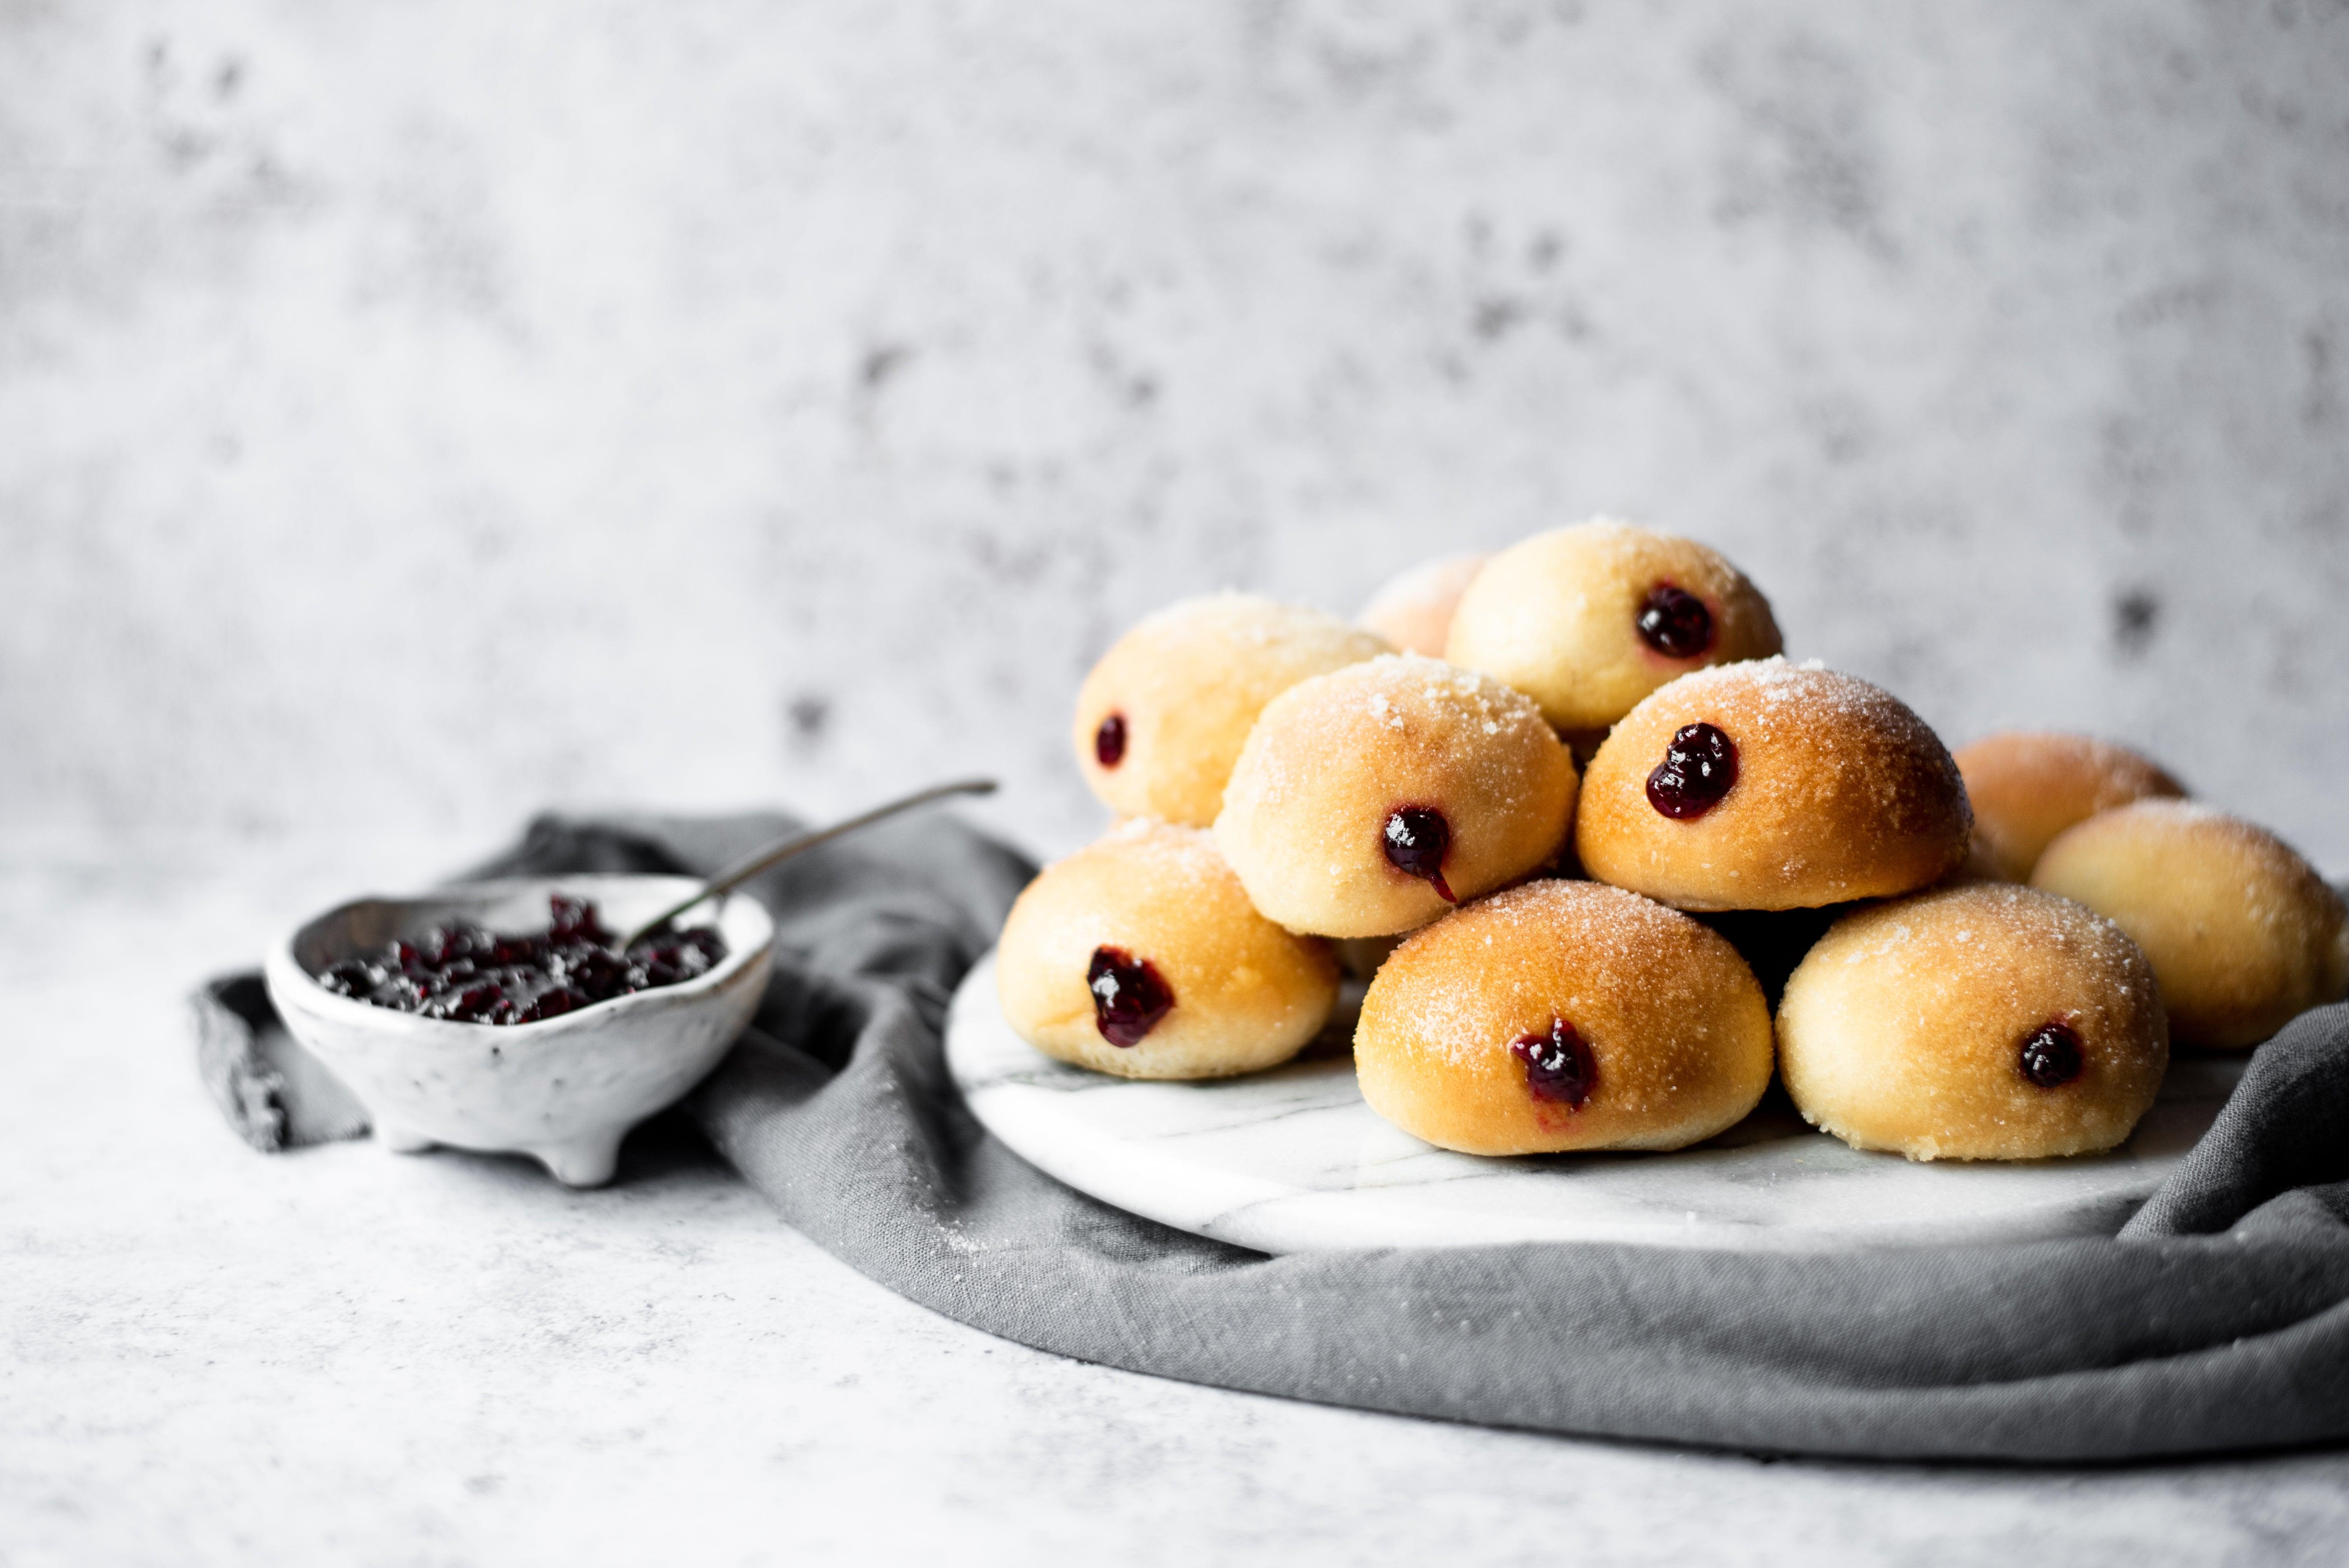 Allinsons-Baked-Doughnuts-FULL-RES-2.jpg